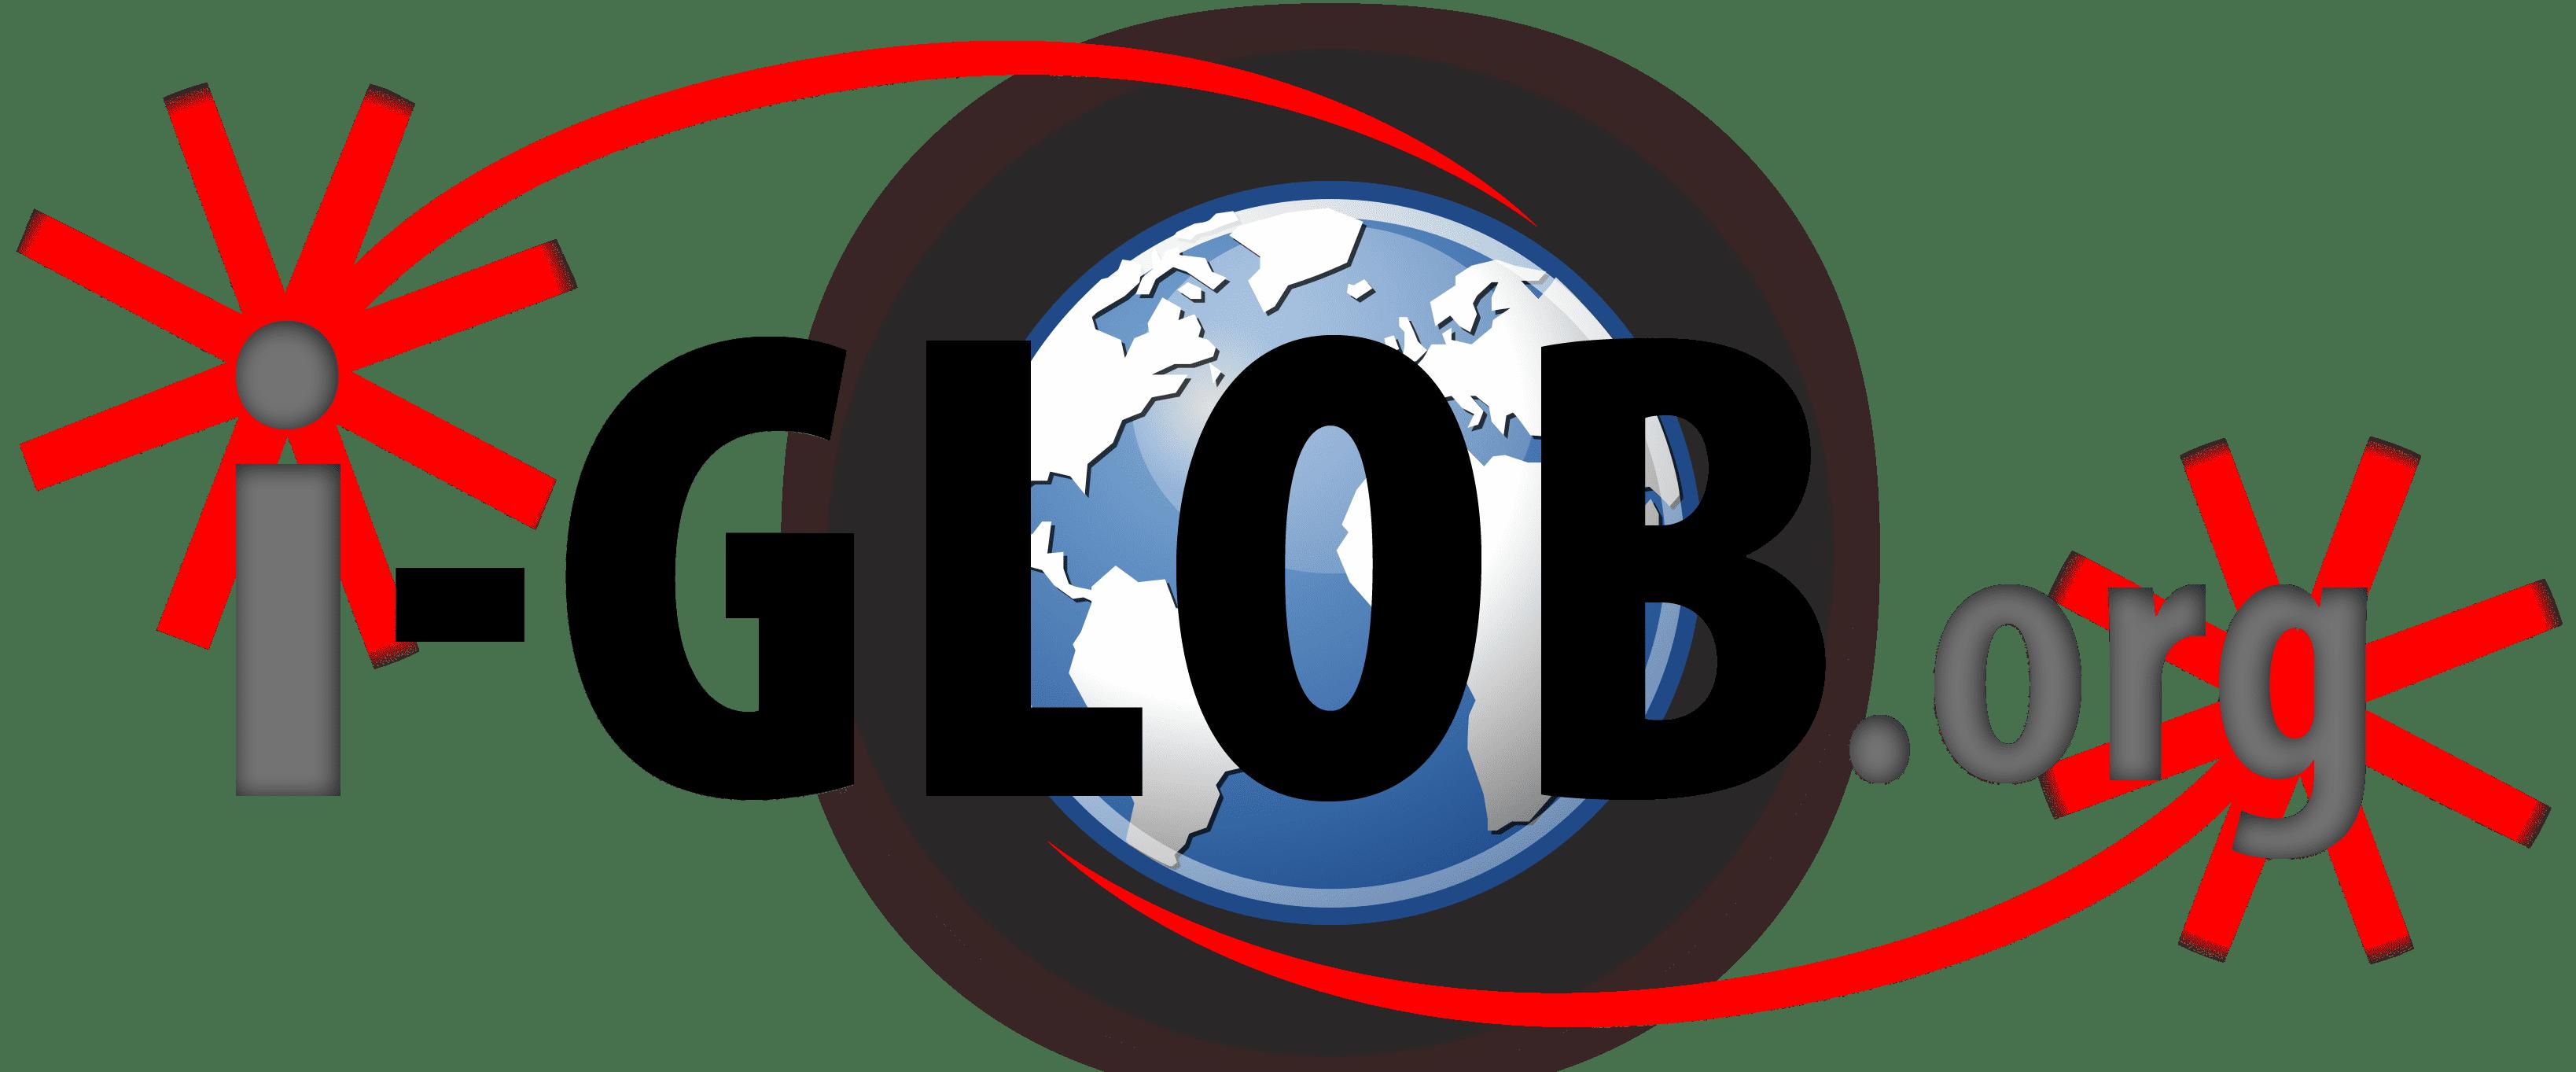 i-glob.org logo